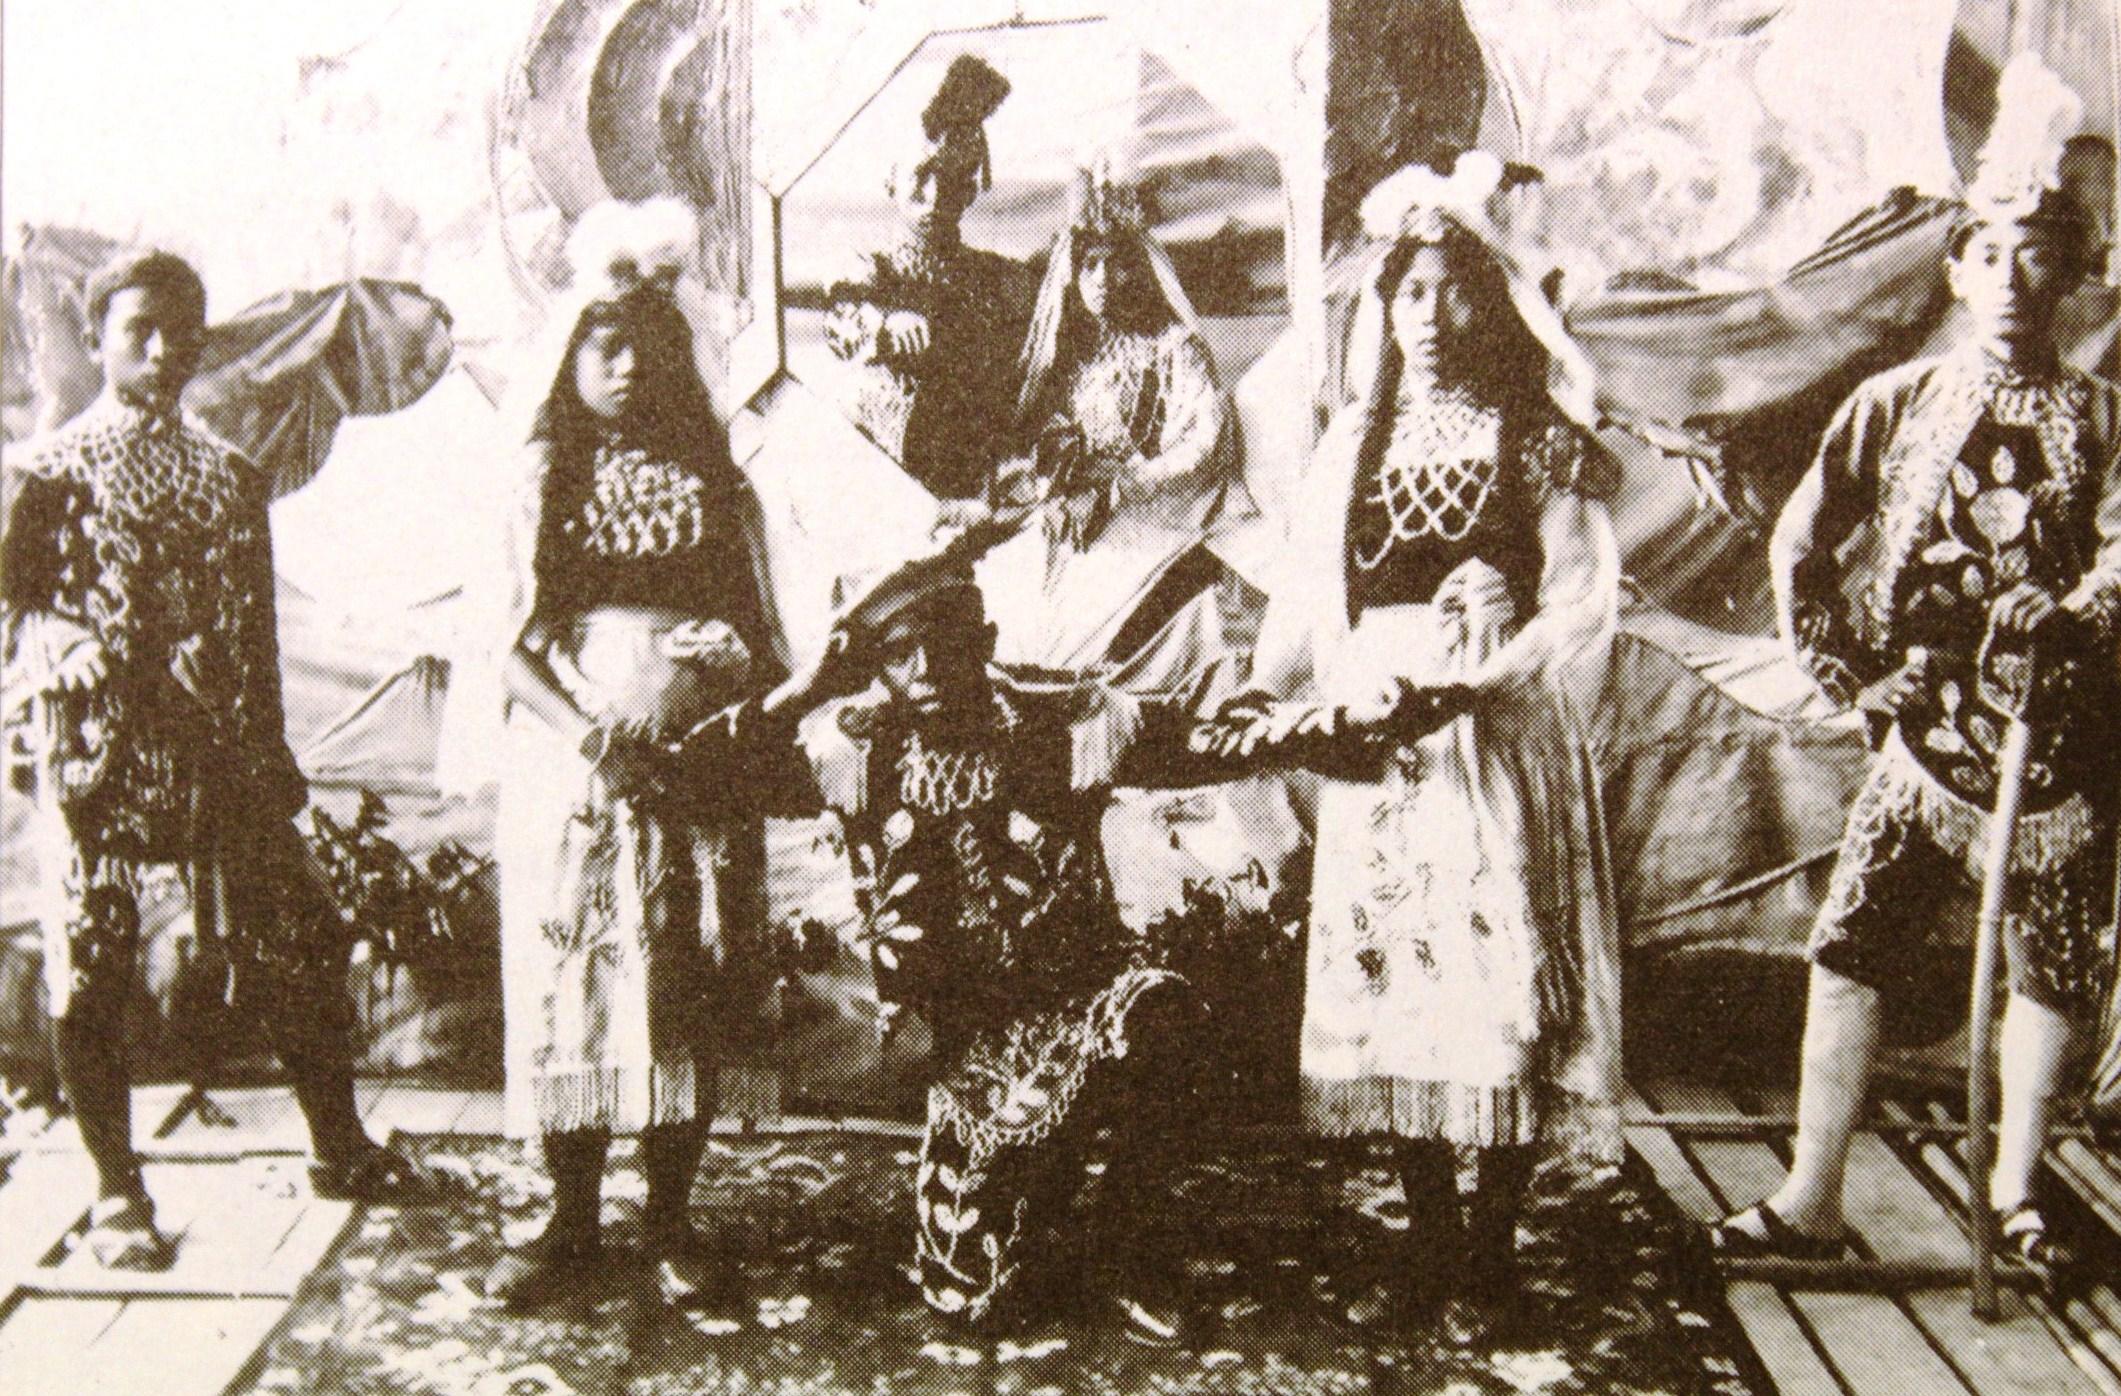 Pentas stamboel lakon 'Jula Juli' di Jawa Tengah tahun 1906. Kira